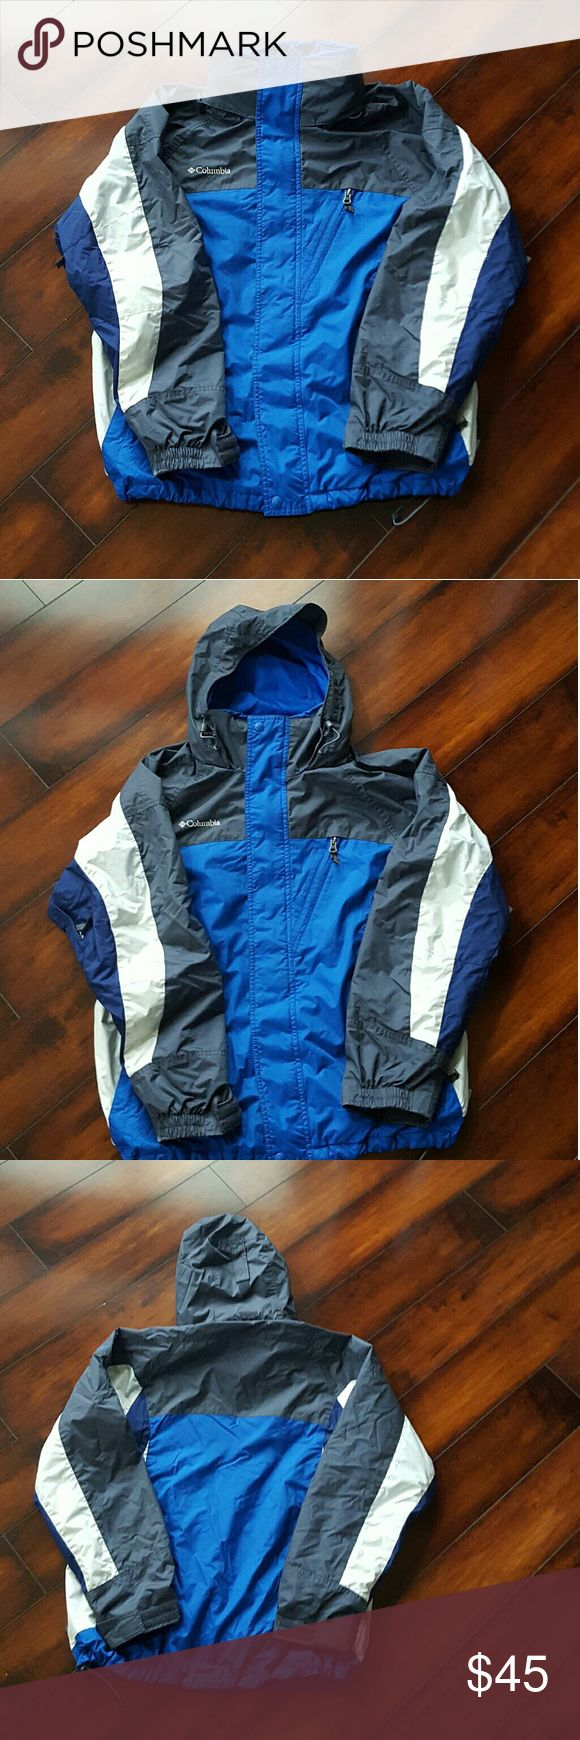 Men s columbia ski sbowboard jacket medium men s blue columbia ski sbowboard jacket size medium